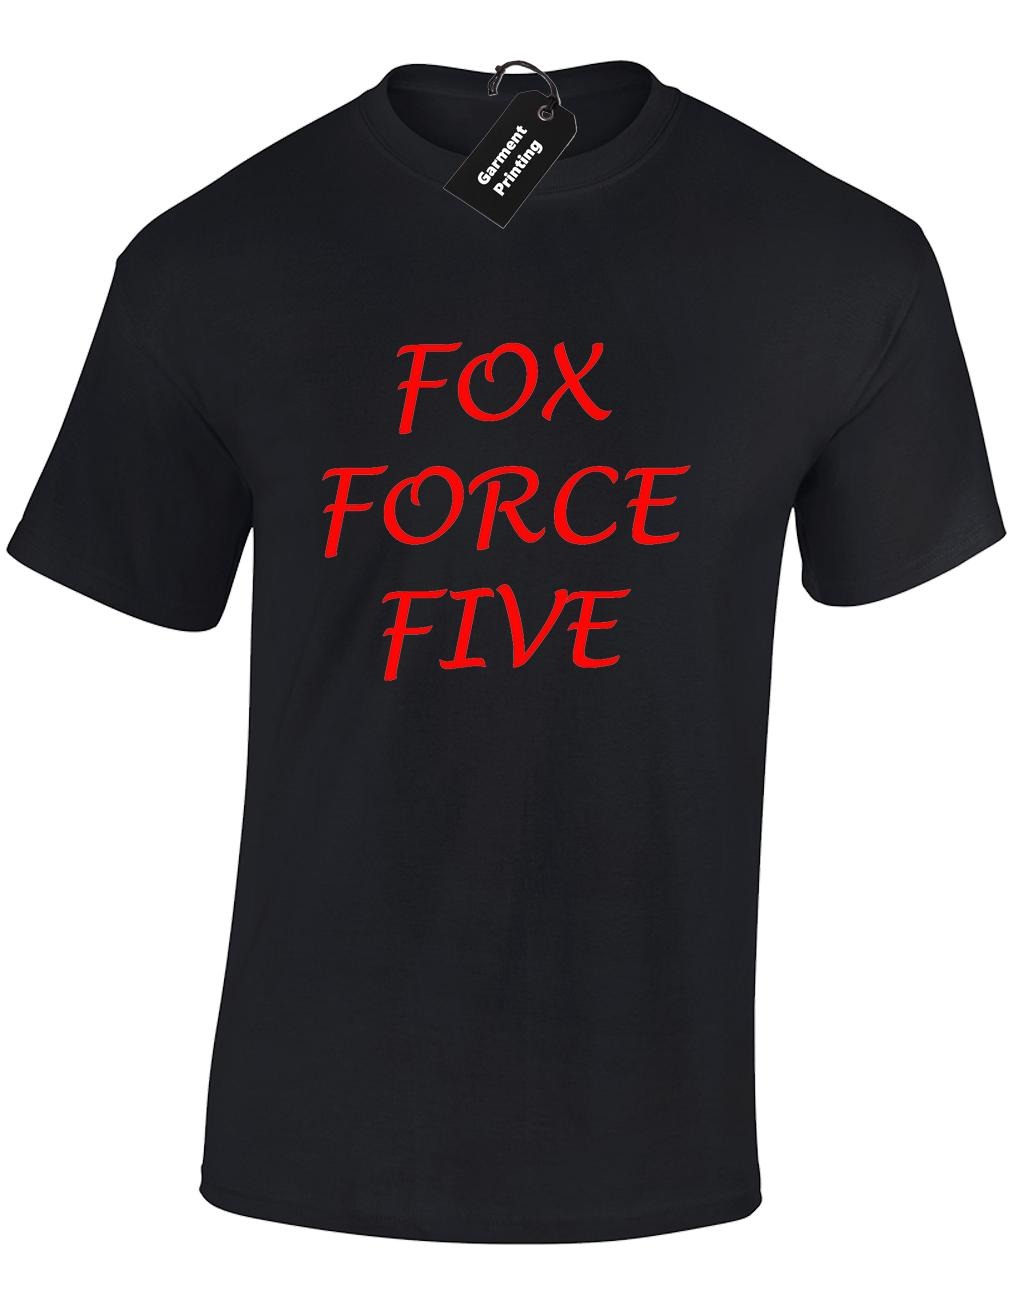 FOX FORCE FIVE MENS T SHIRT COOL RETRO KILL BILL MOVIE FILM FUNNY  SAMURAIcolour jersey Print t shirt